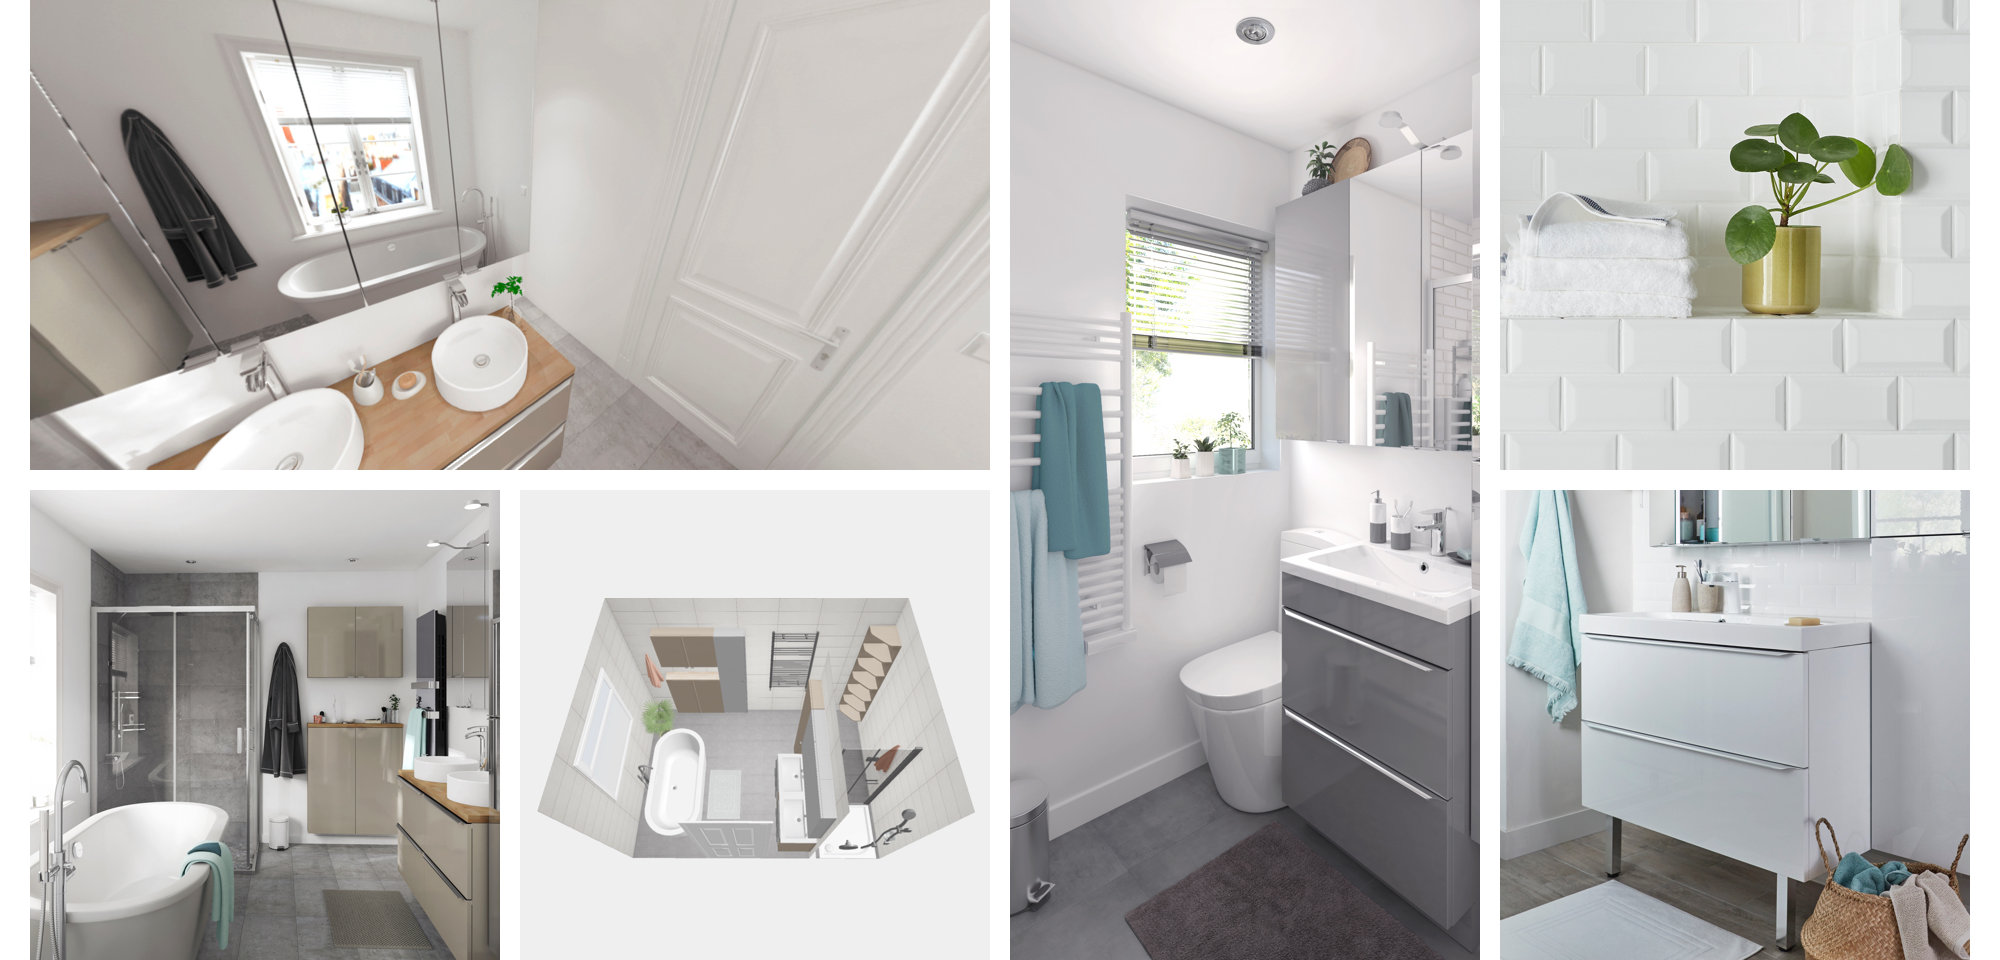 B&Q Bathroom Planner | Design your own bathroom online